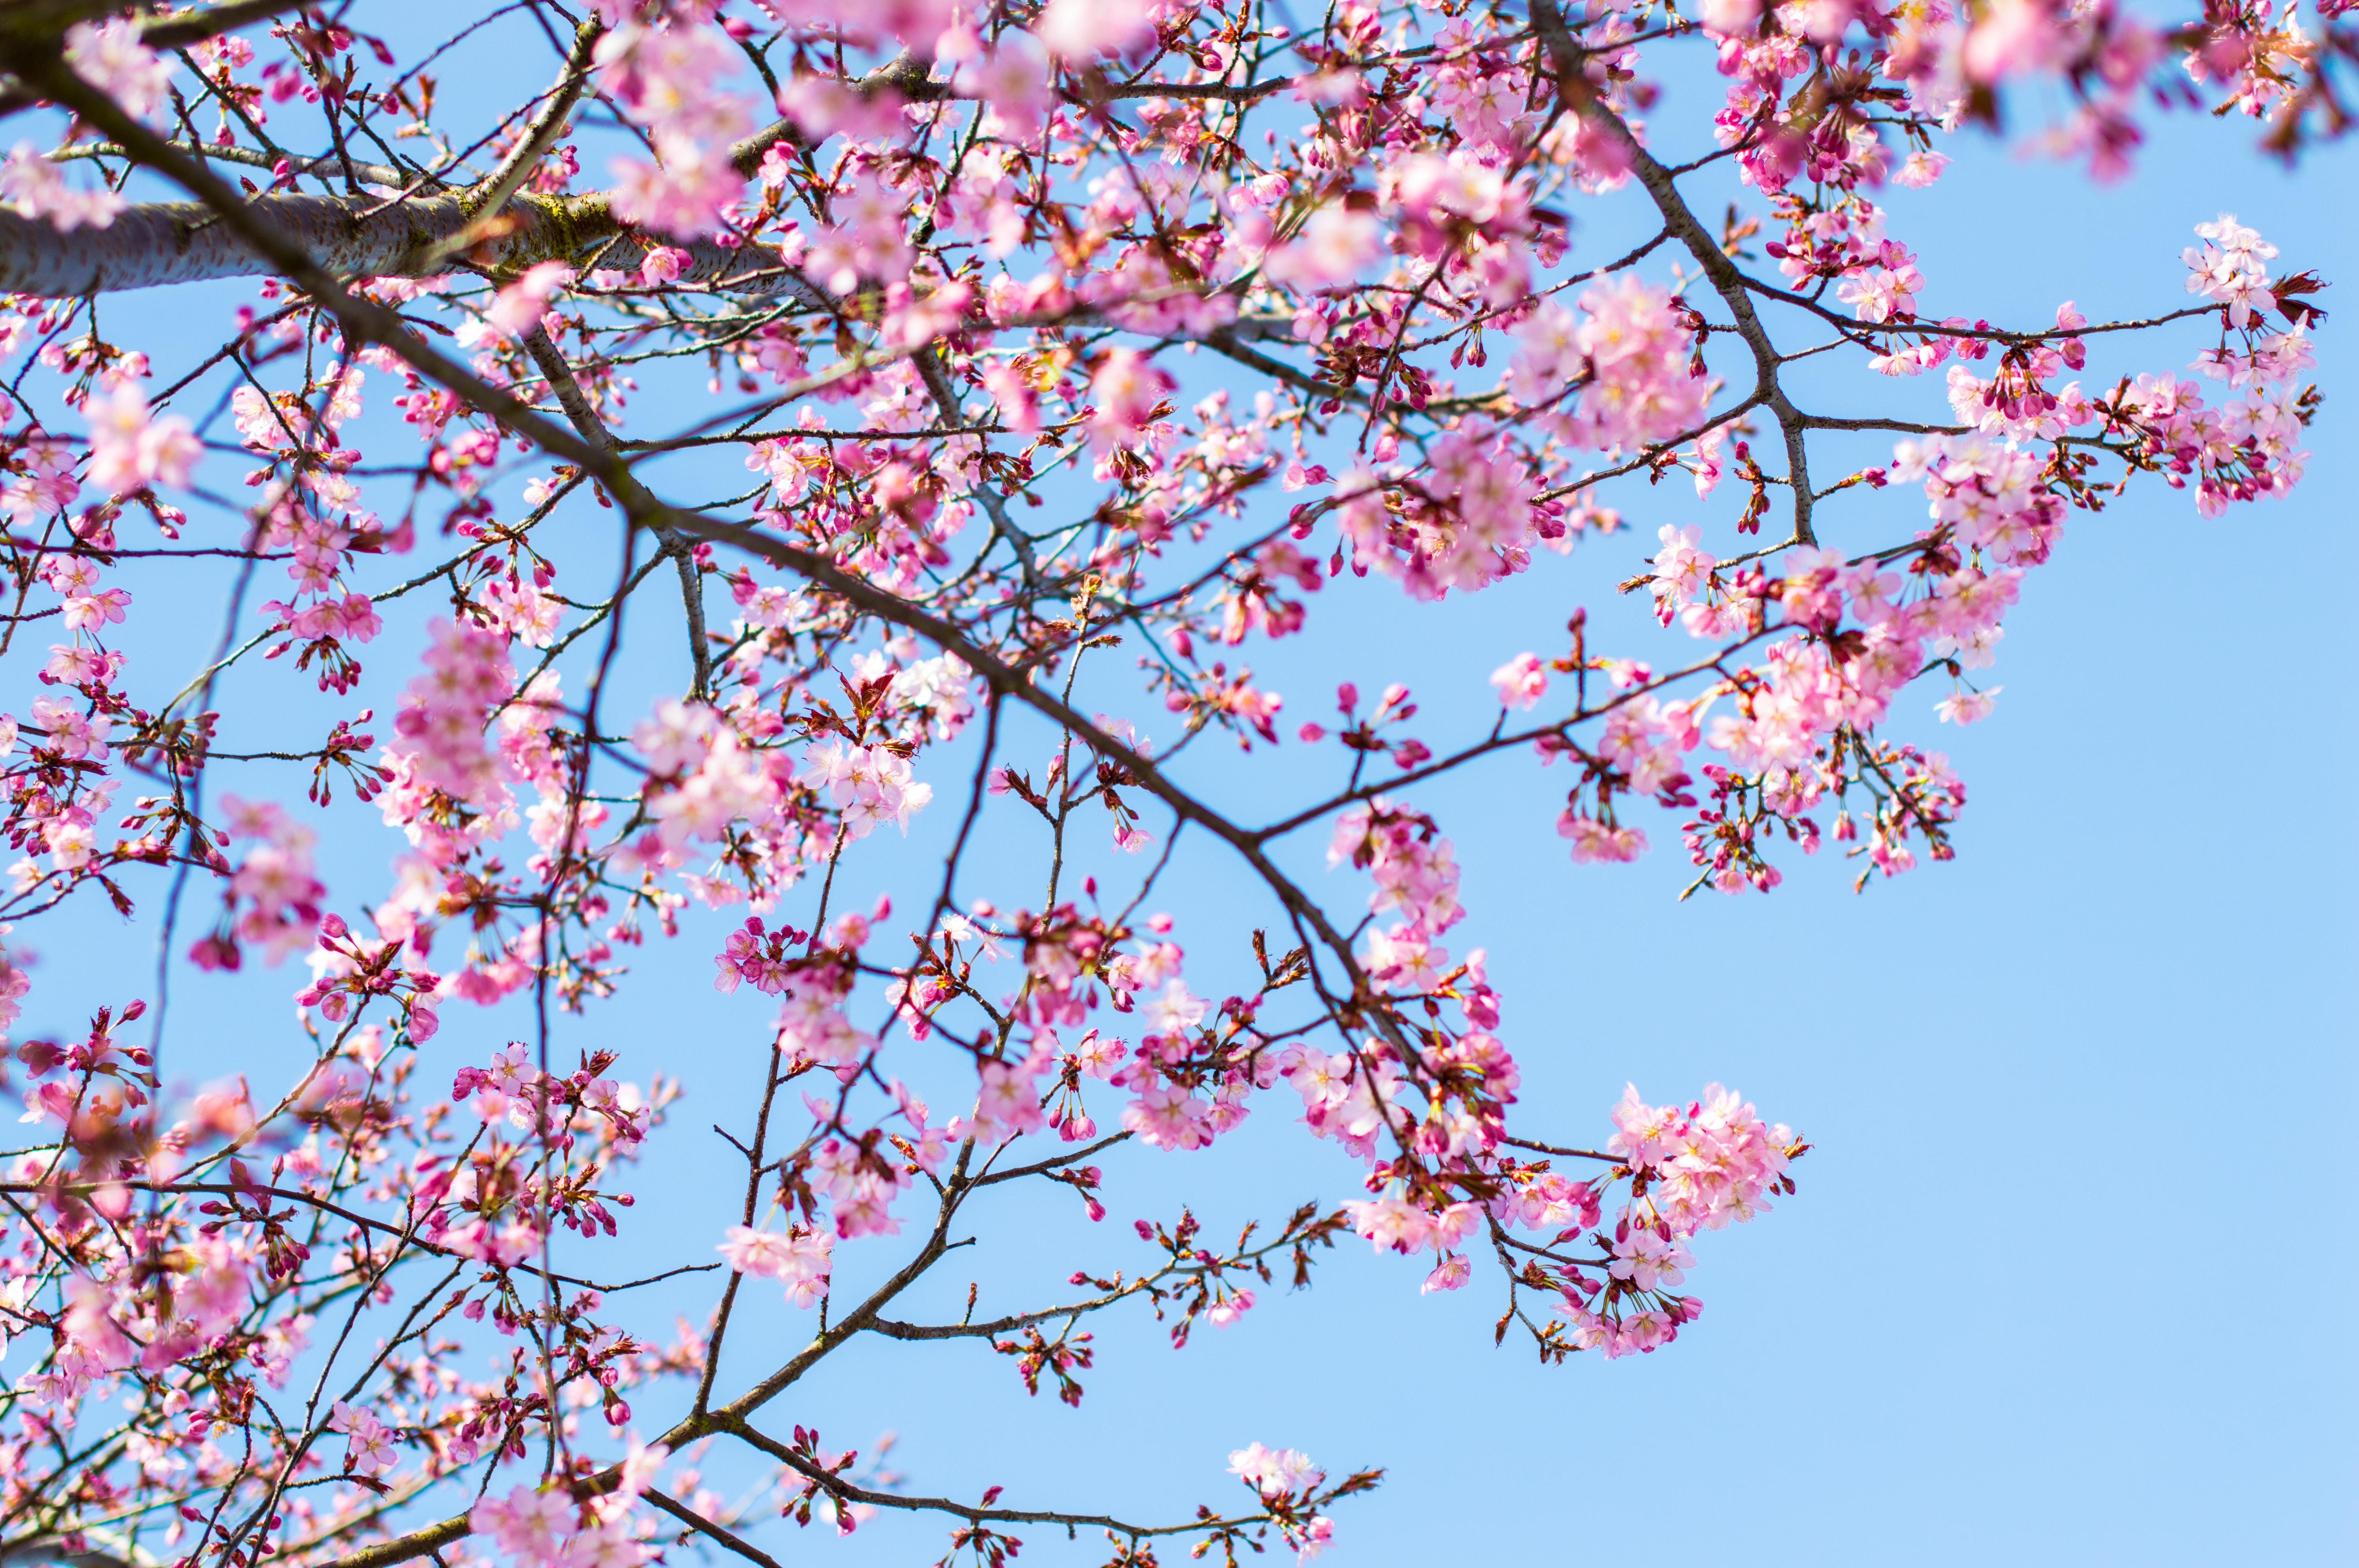 cherry blossom tree under clear blue sky